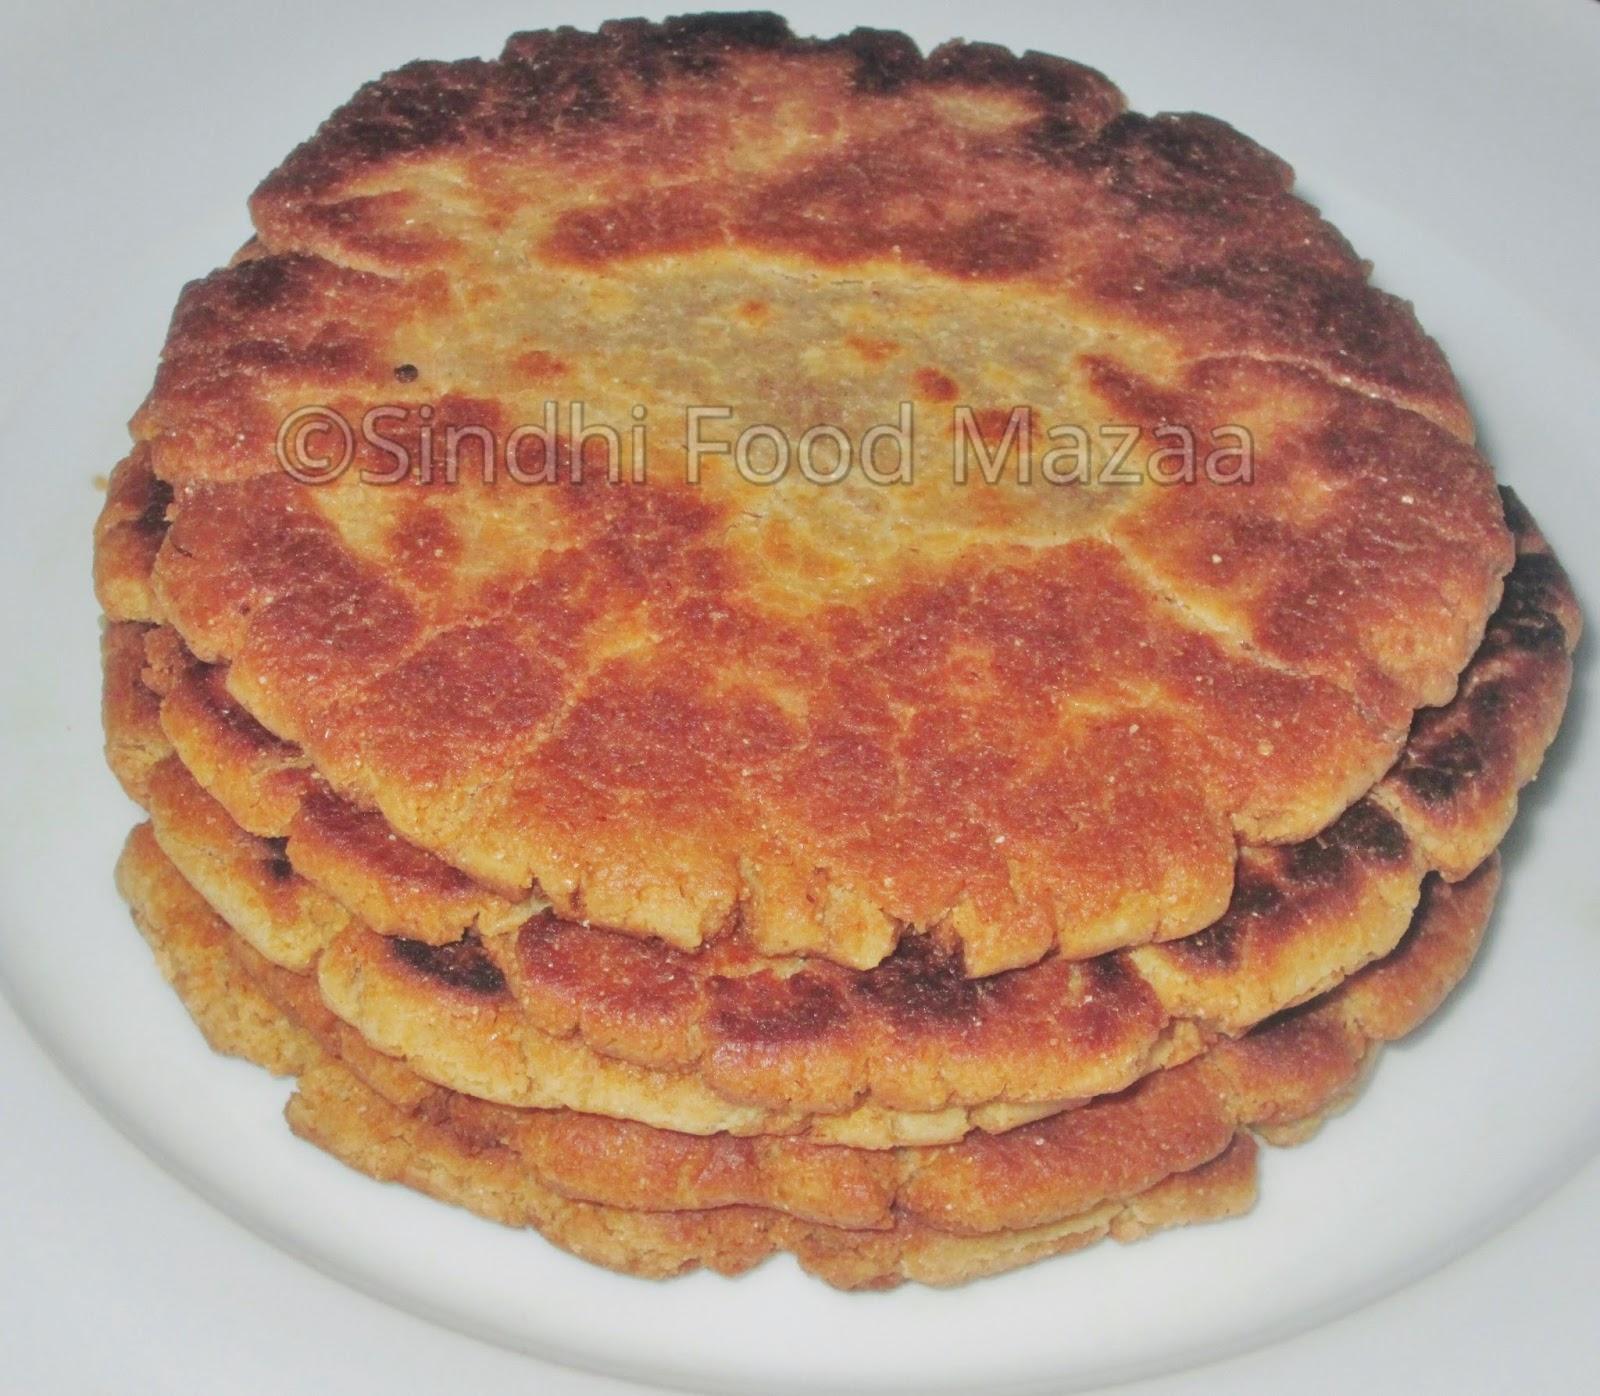 Lolo S Cakes Sweets: Sindhi Food Mazaa: GUR JO LOLO / SWEET ROTI WITH JAGGERY